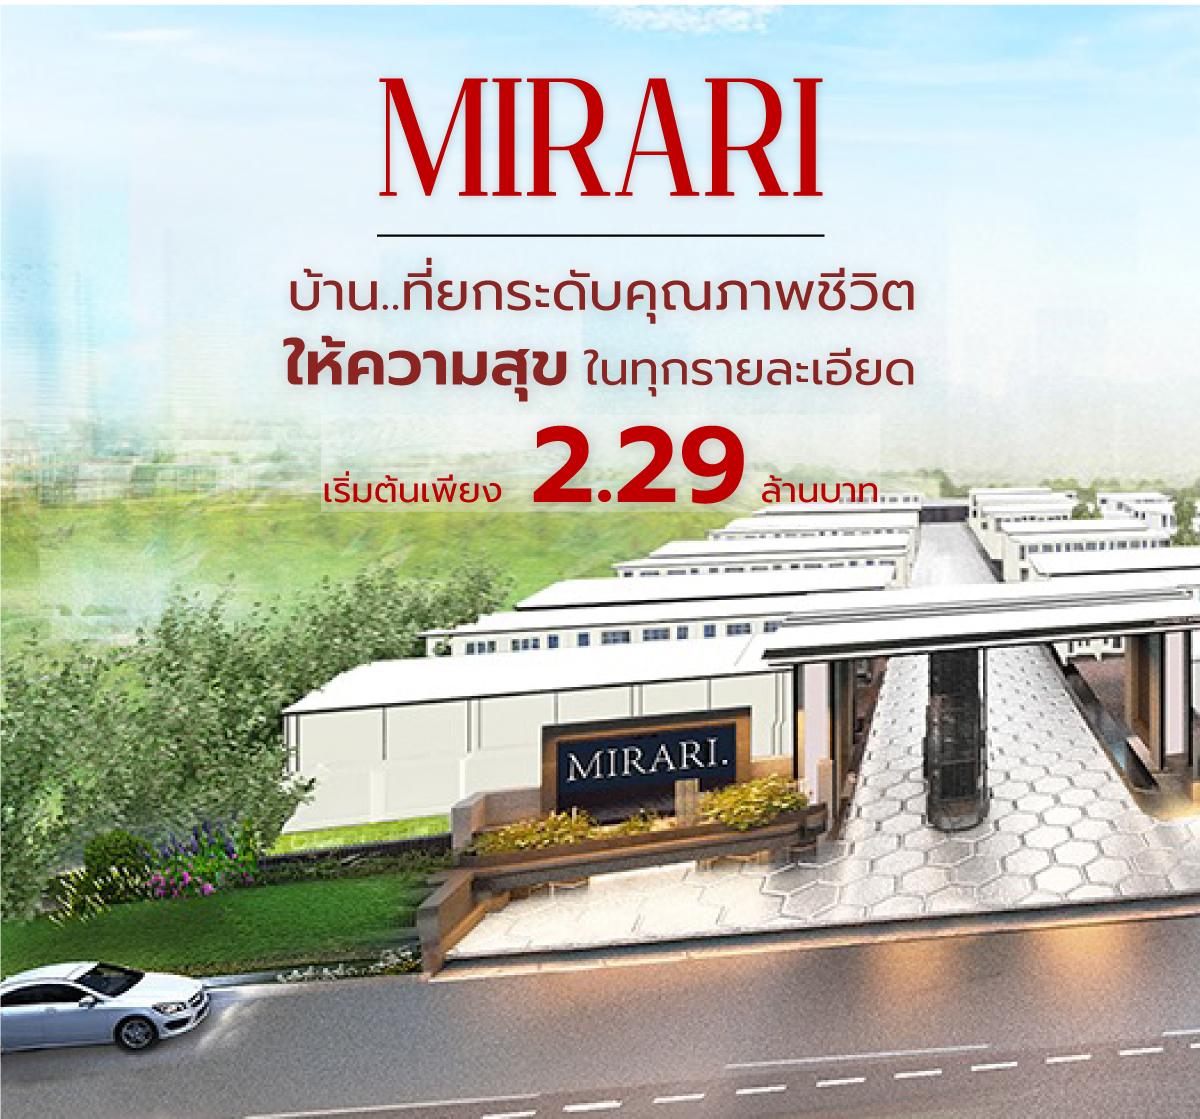 Mirari-Banner-Mobile-01